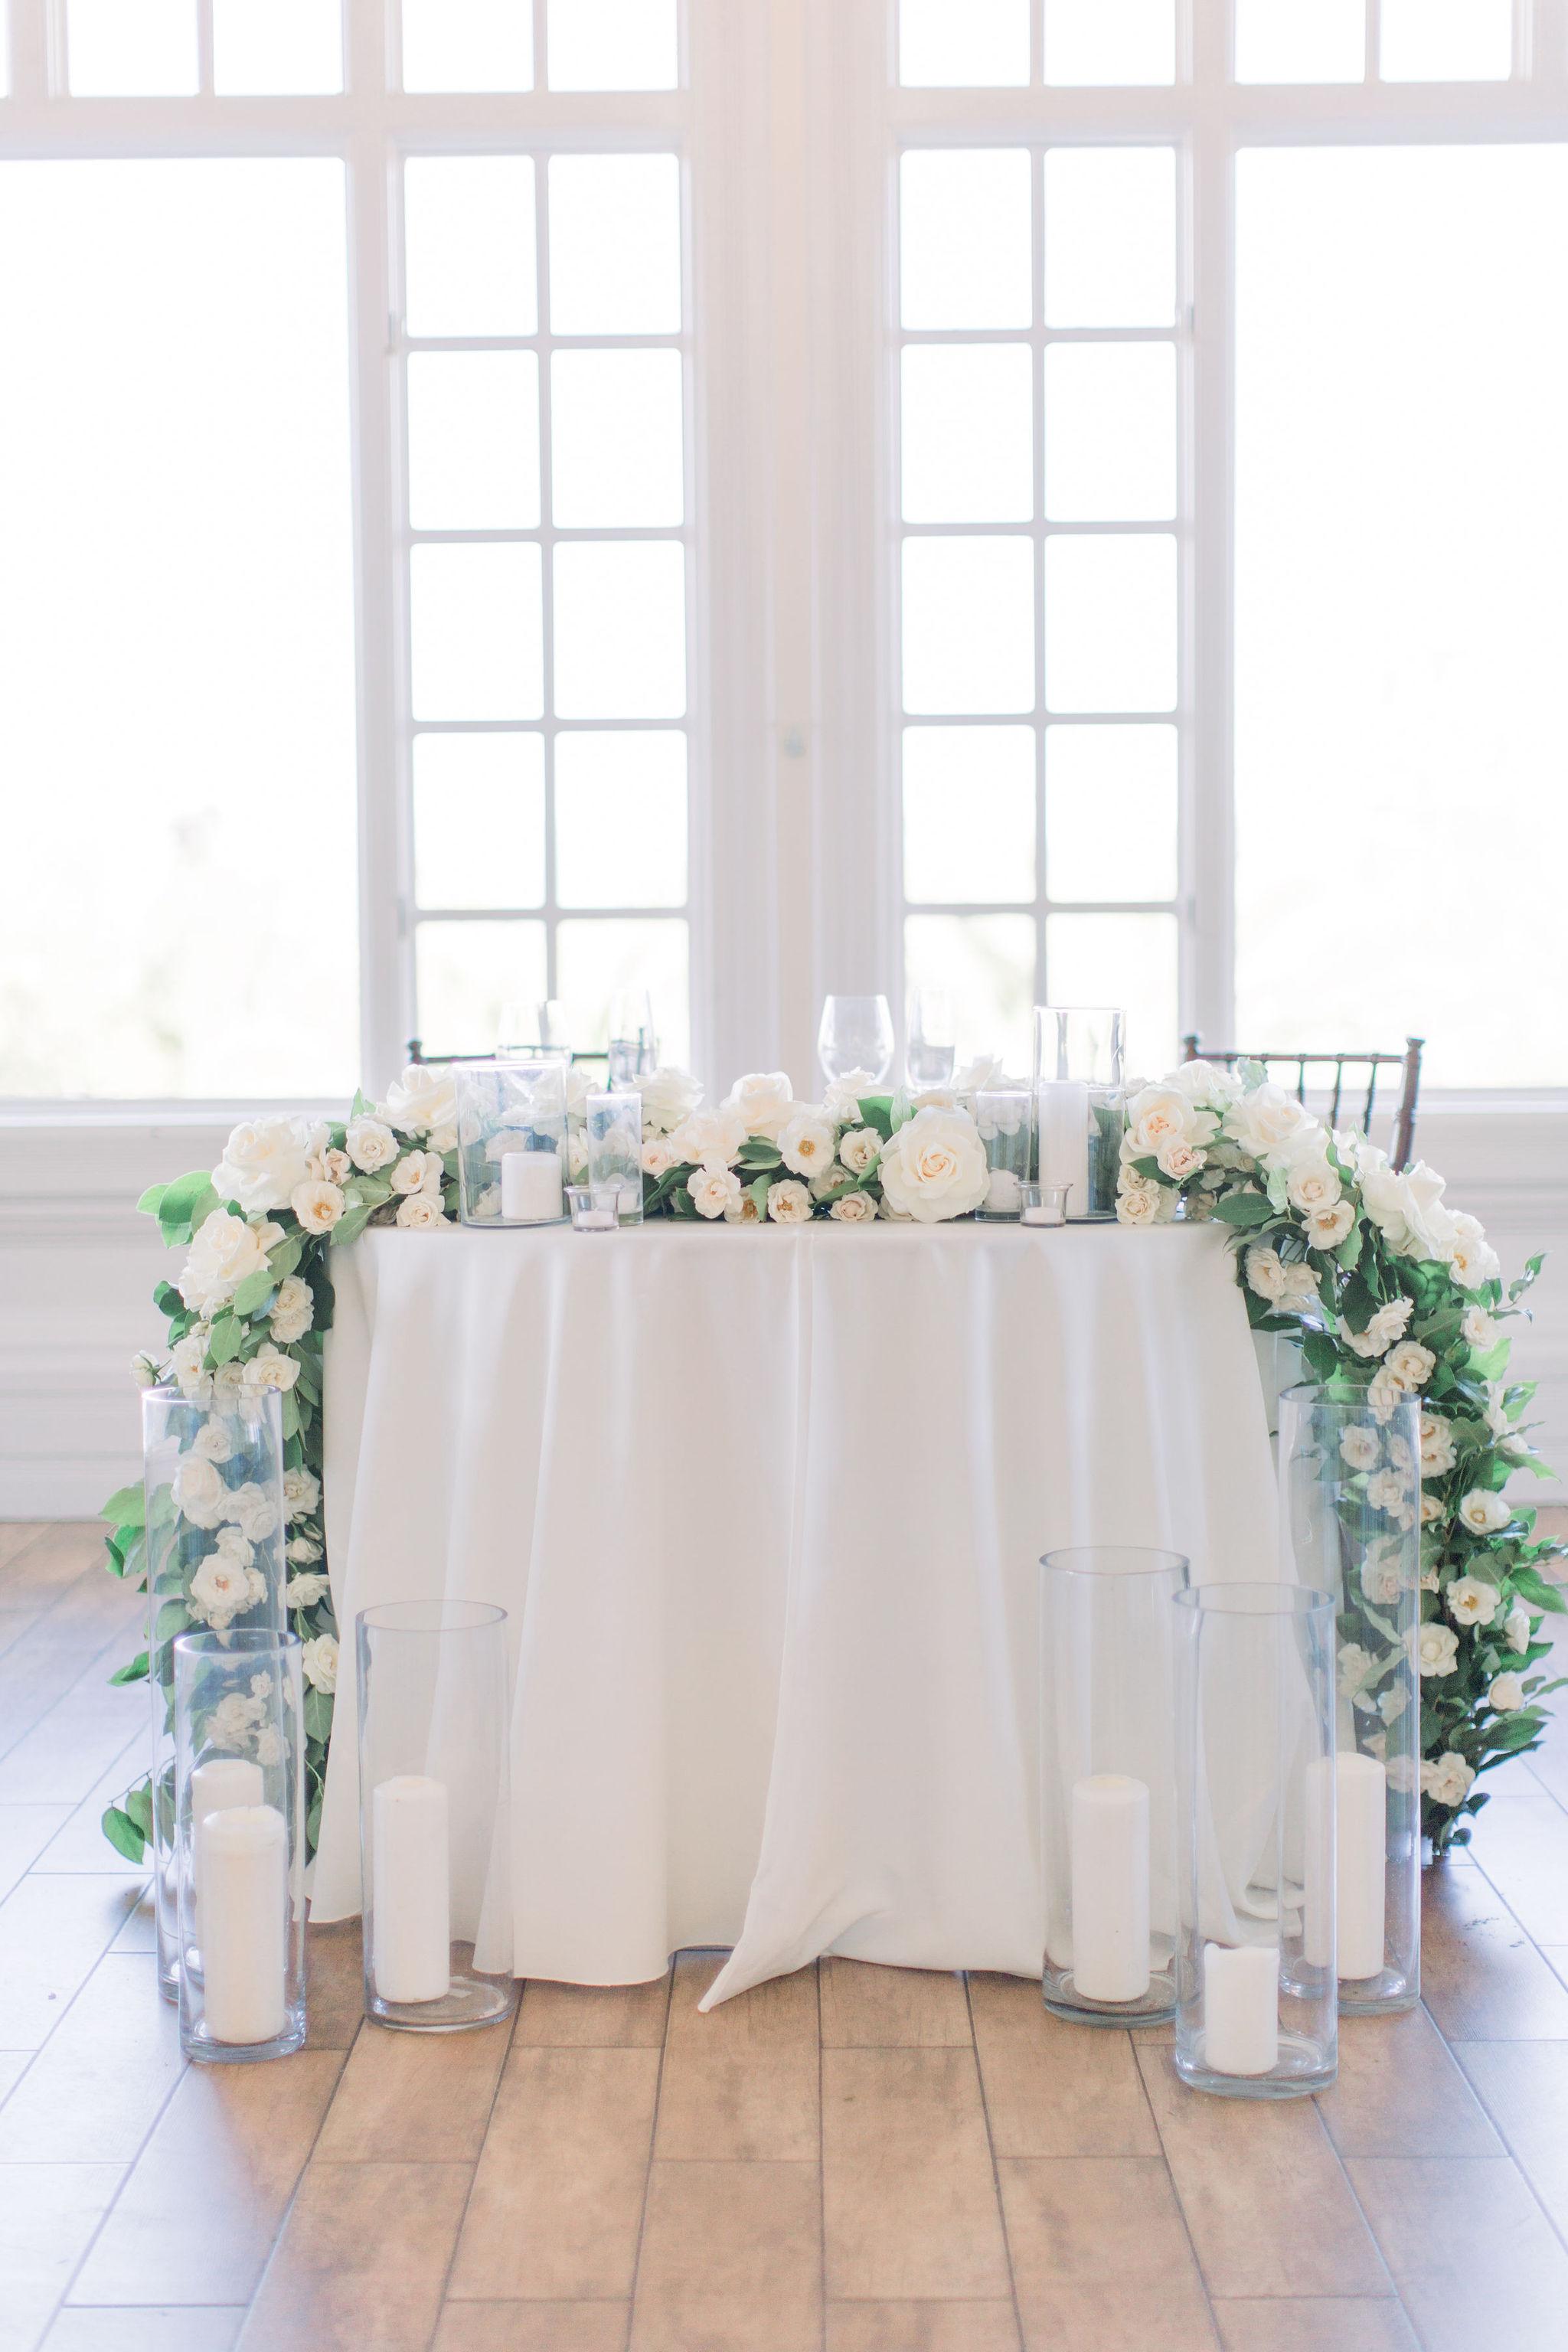 sydney-bodi-wedding-budget-friendly-blooms-carmel-mountain-white-flowers-6.jpg